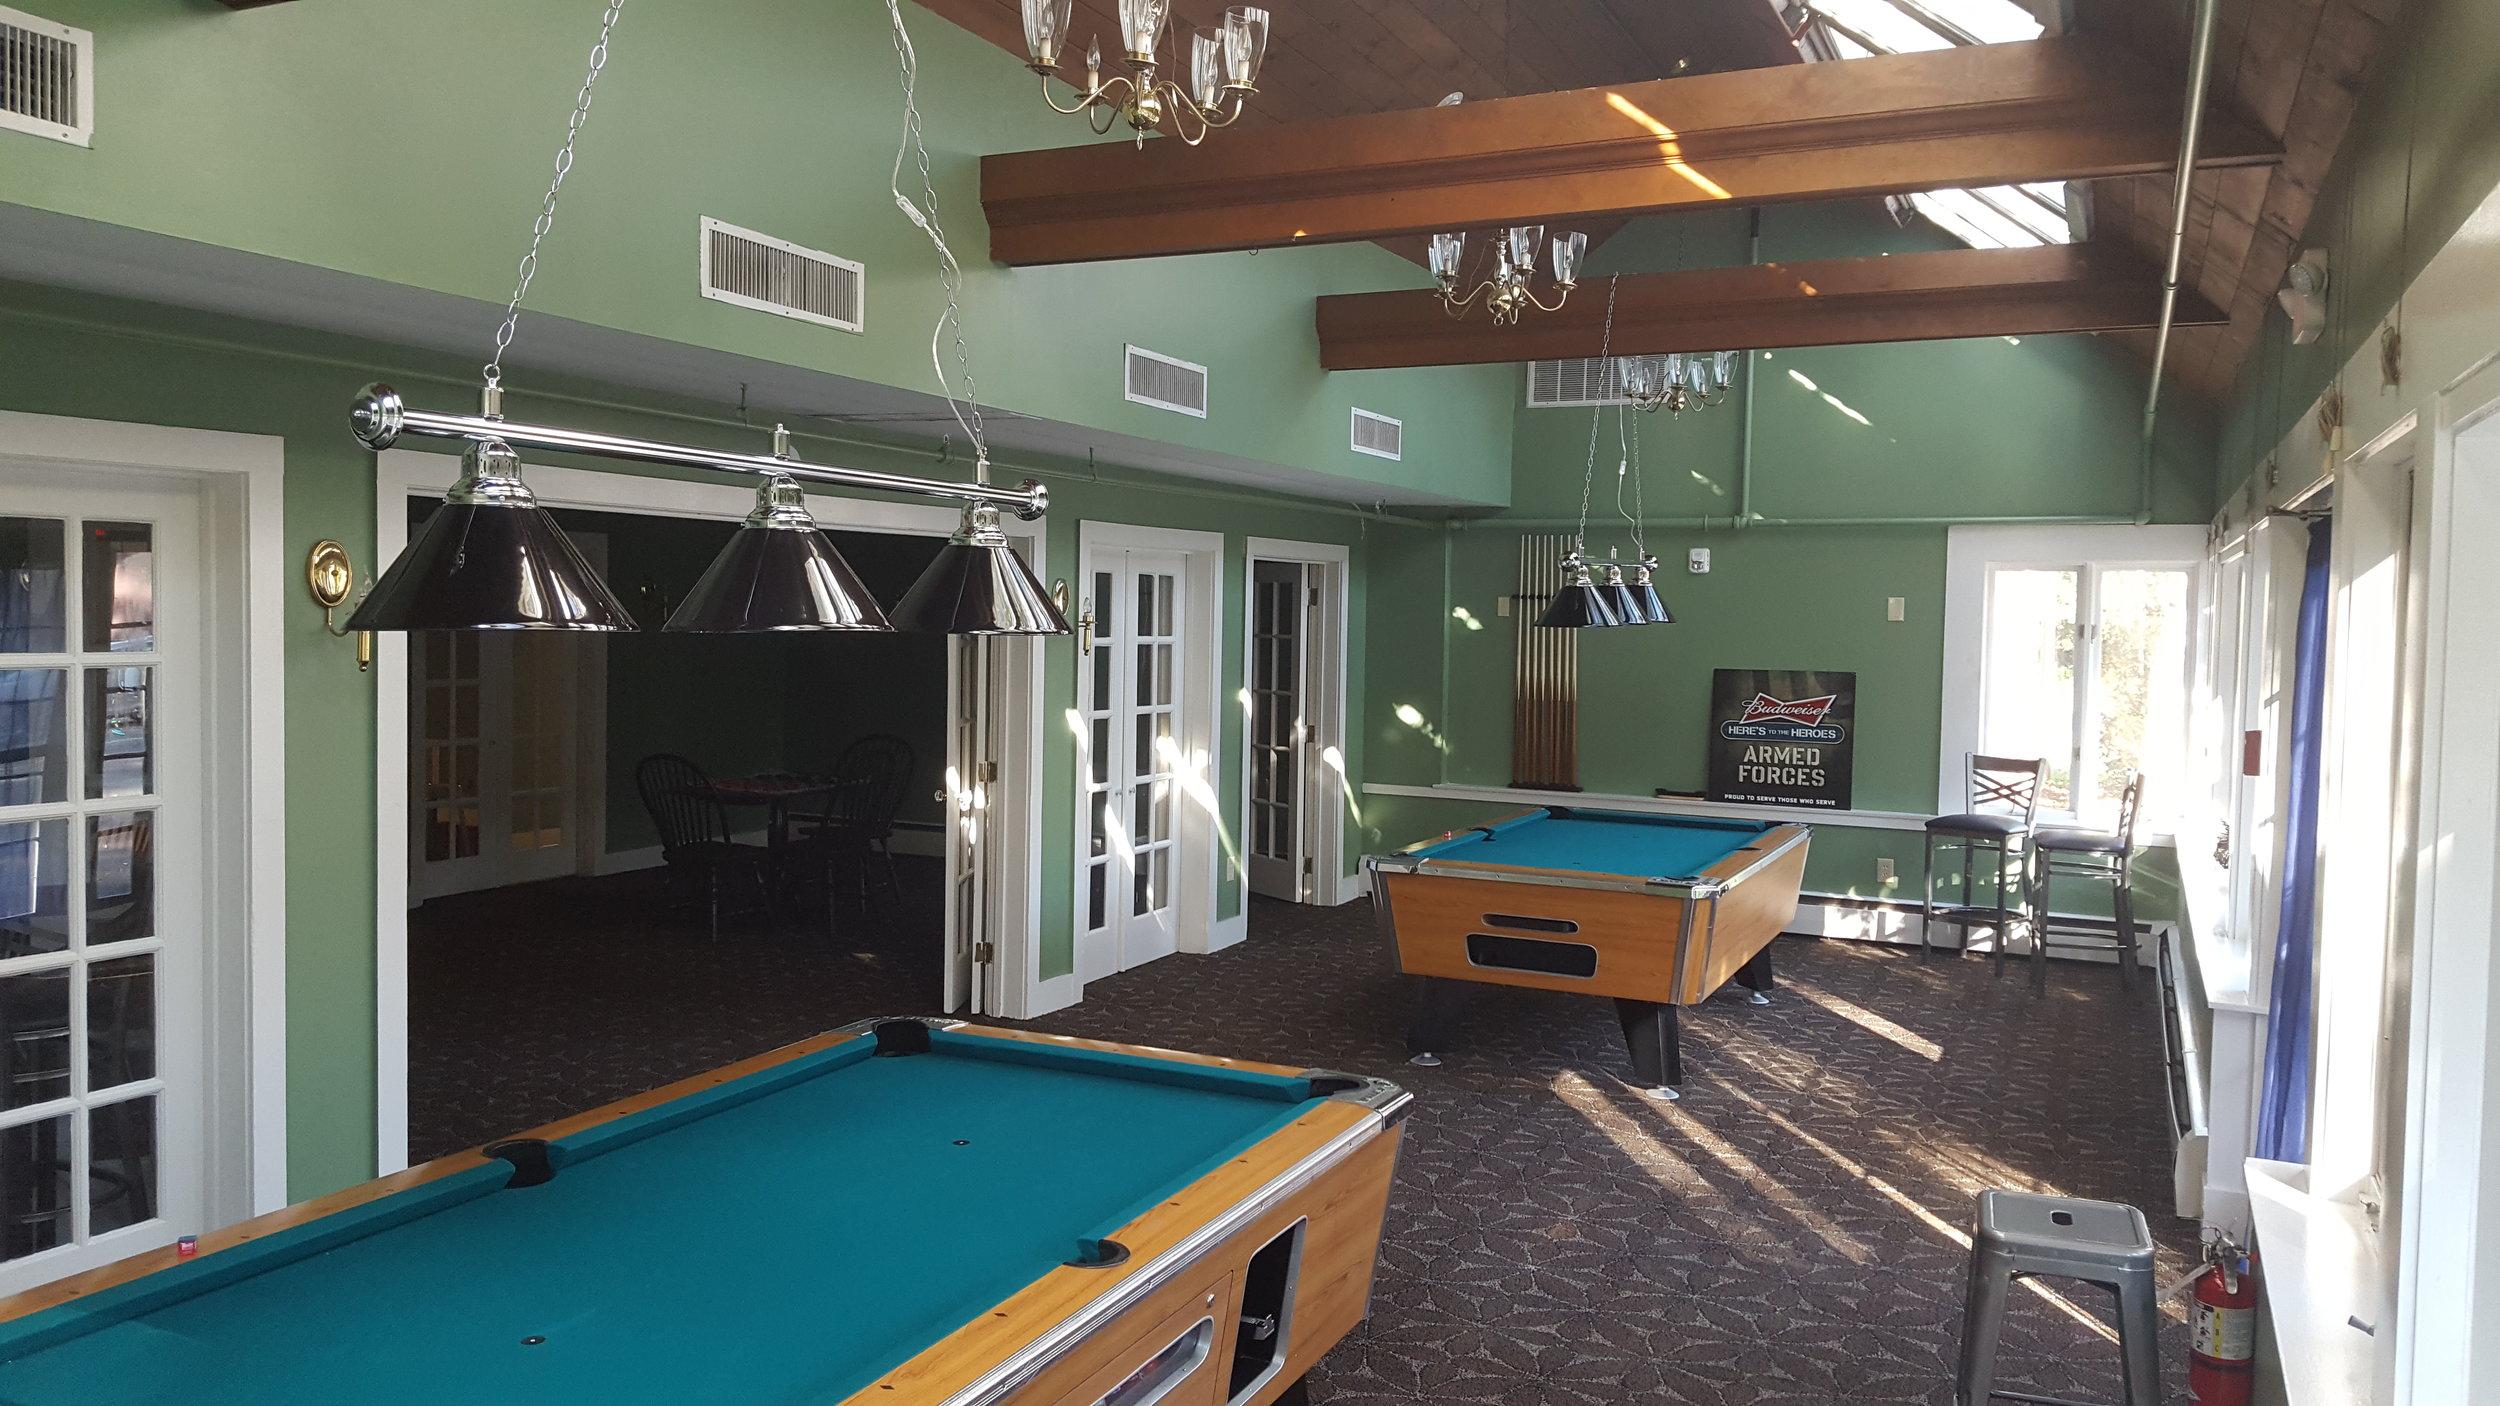 clubvt-billiards-room-putney-vt.jpg